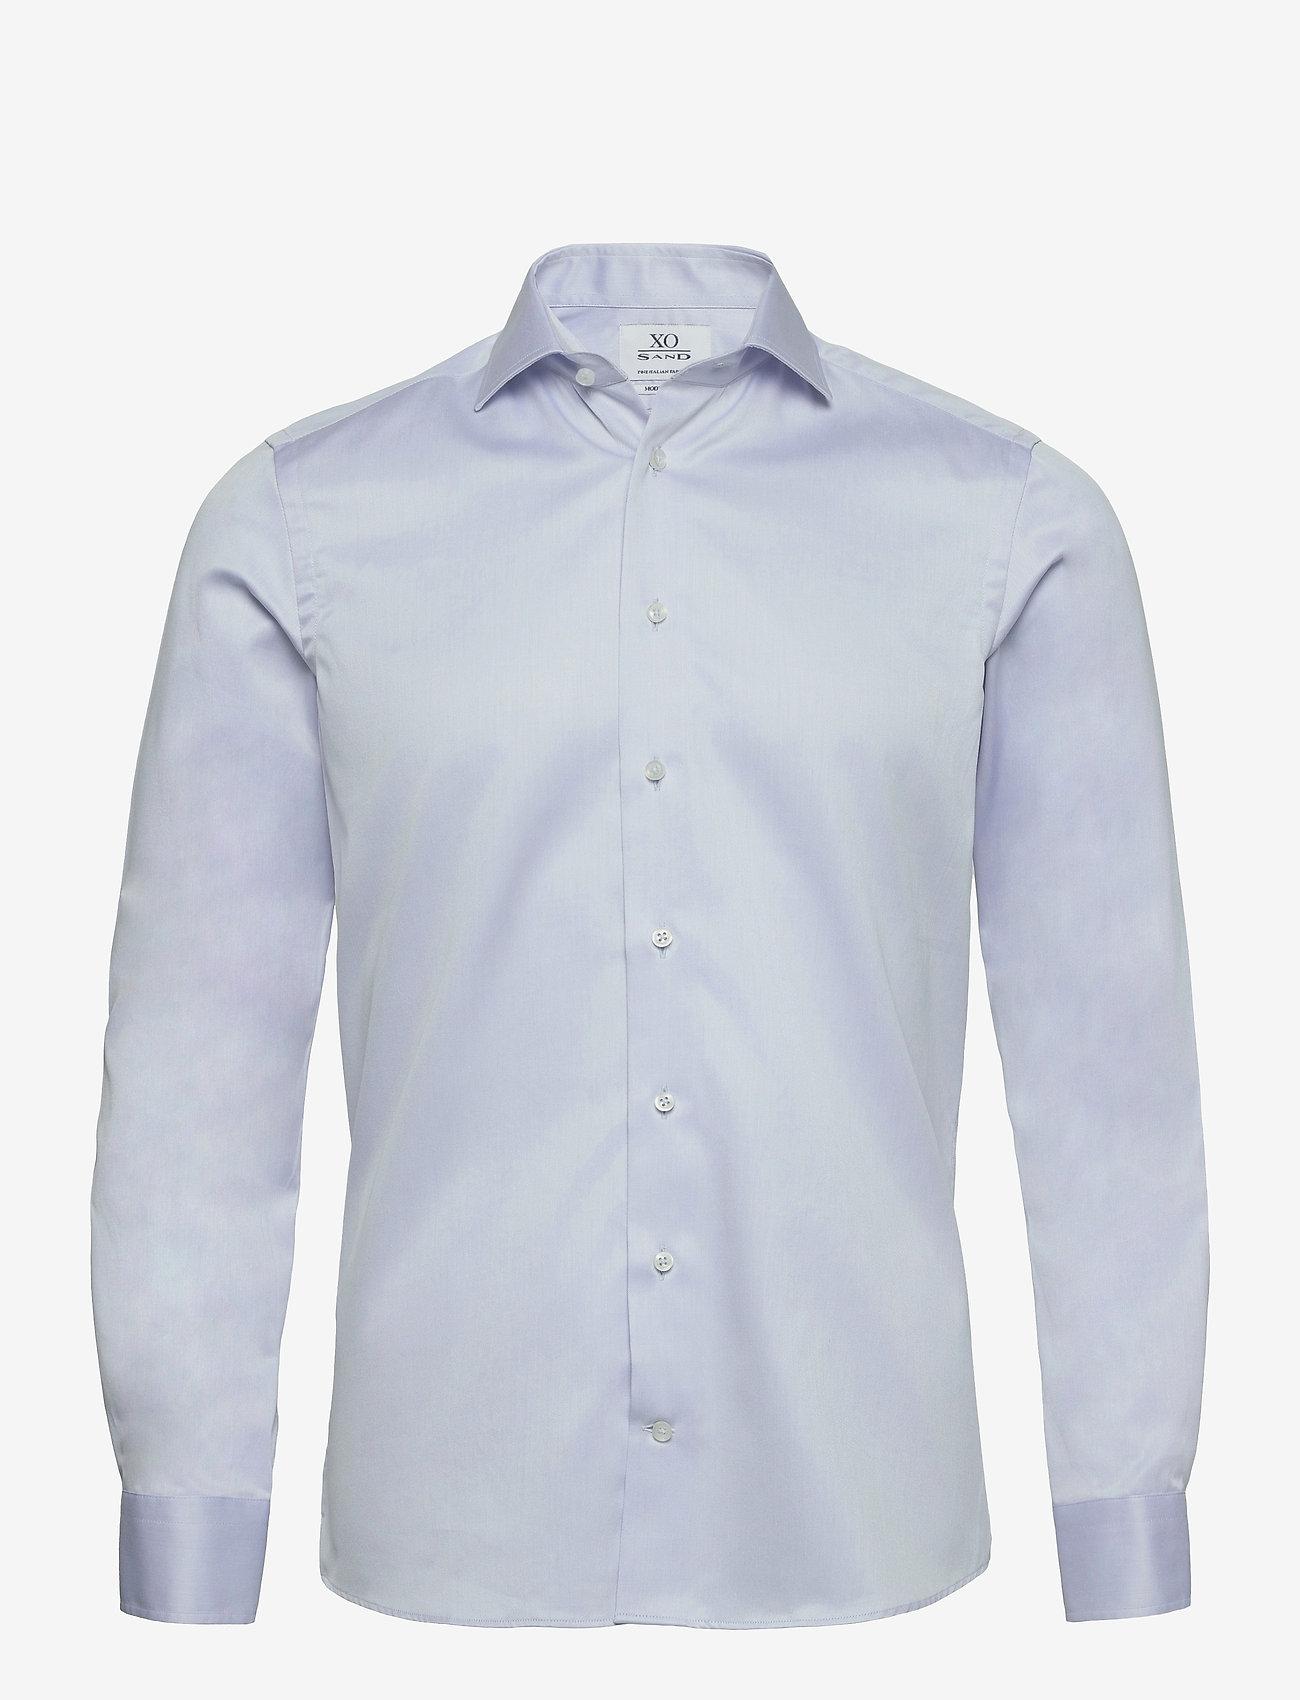 XO Shirtmaker by Sand Copenhagen - 8085 - Gordon FC - basic skjortor - blue - 0